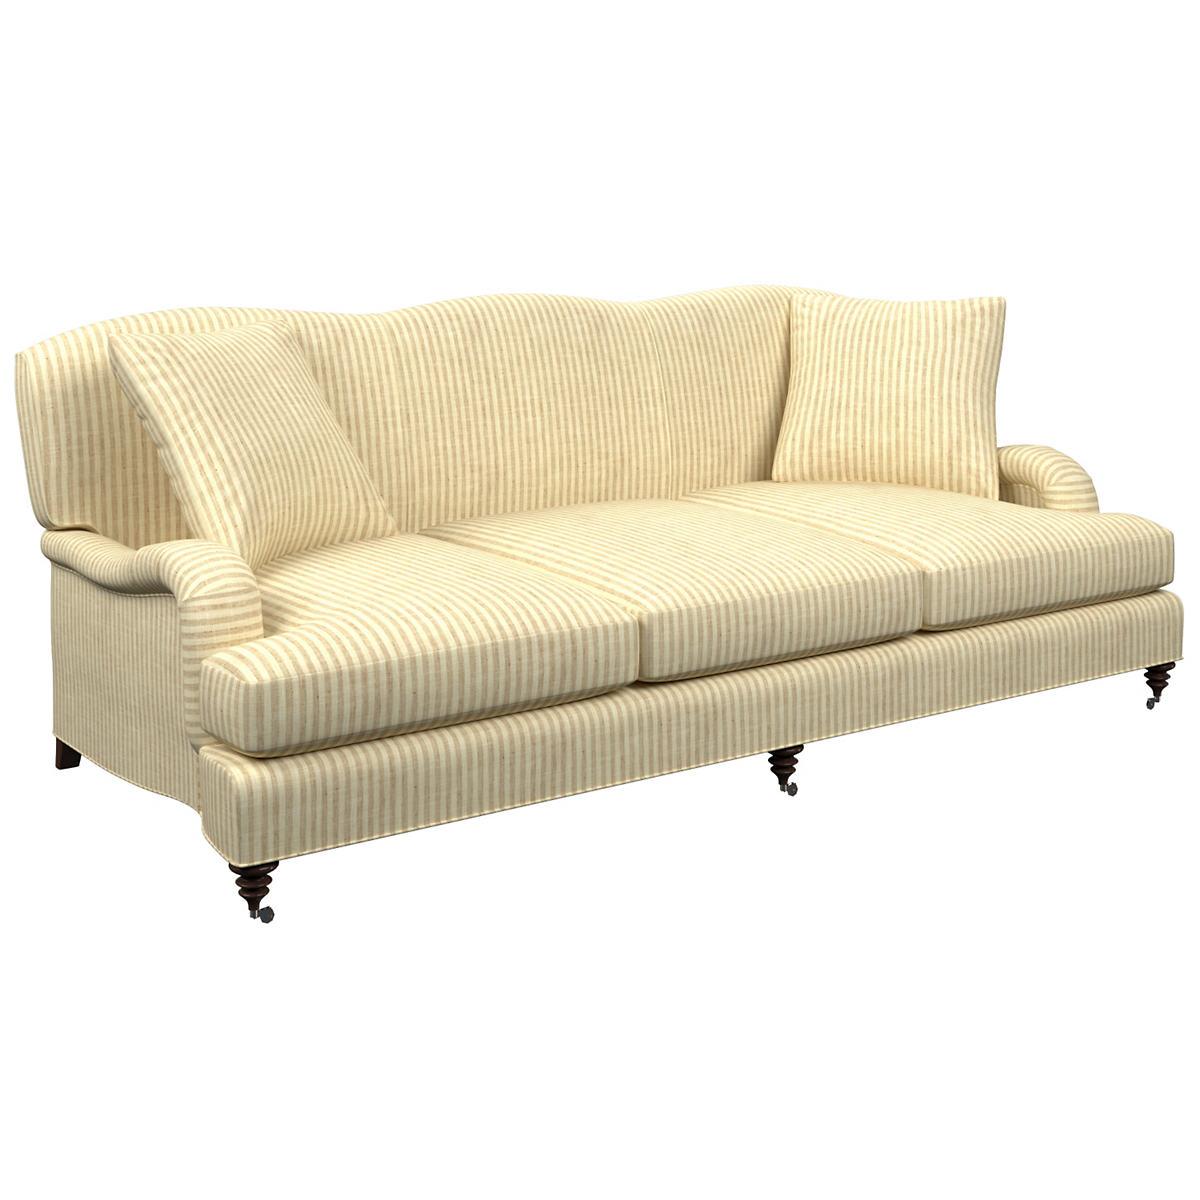 Adams Ticking Natural Litchfield 3 Seater Sofa